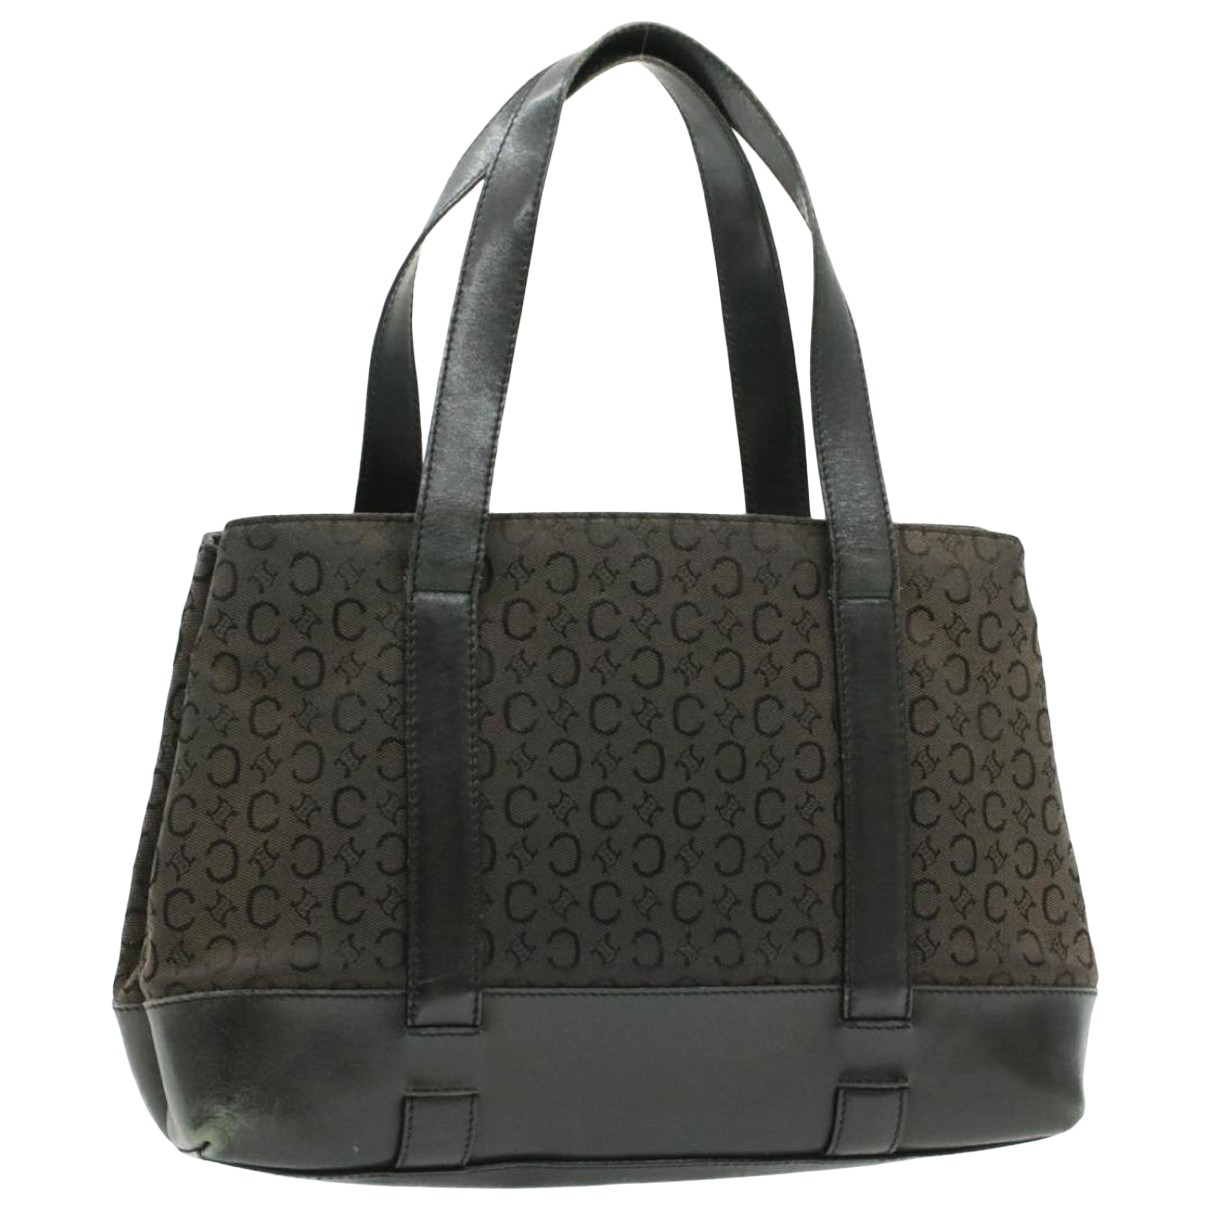 Celine \N Black Cloth handbag for Women \N